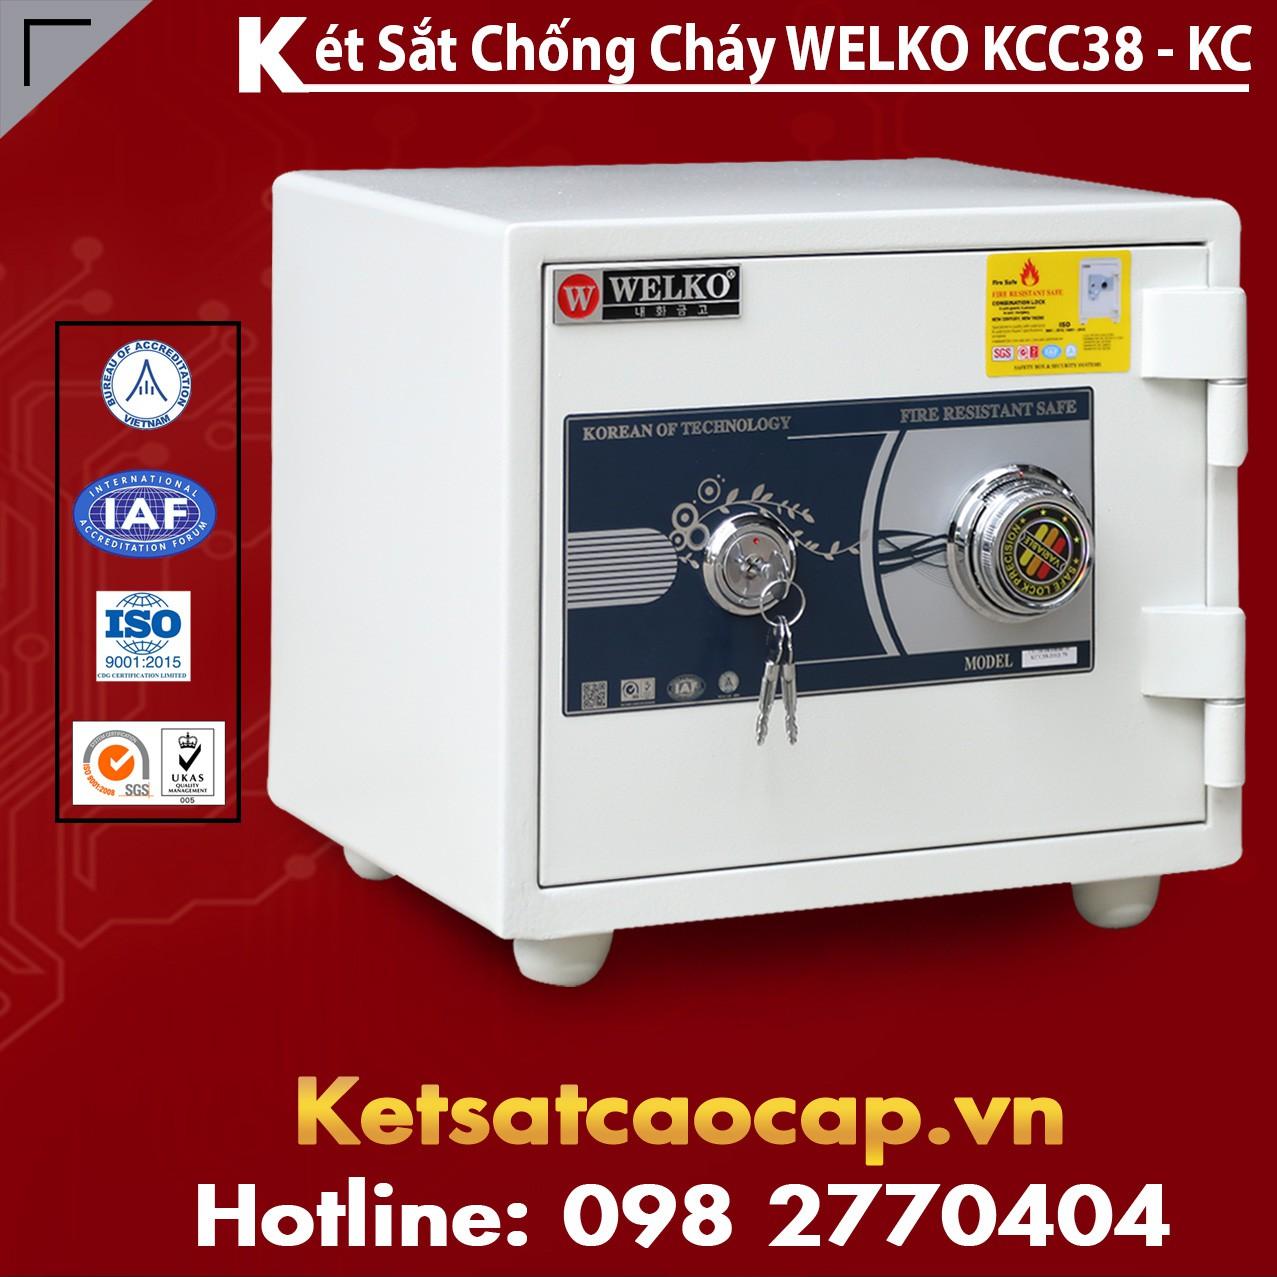 Mua Két Sắt KCC38 White - KC